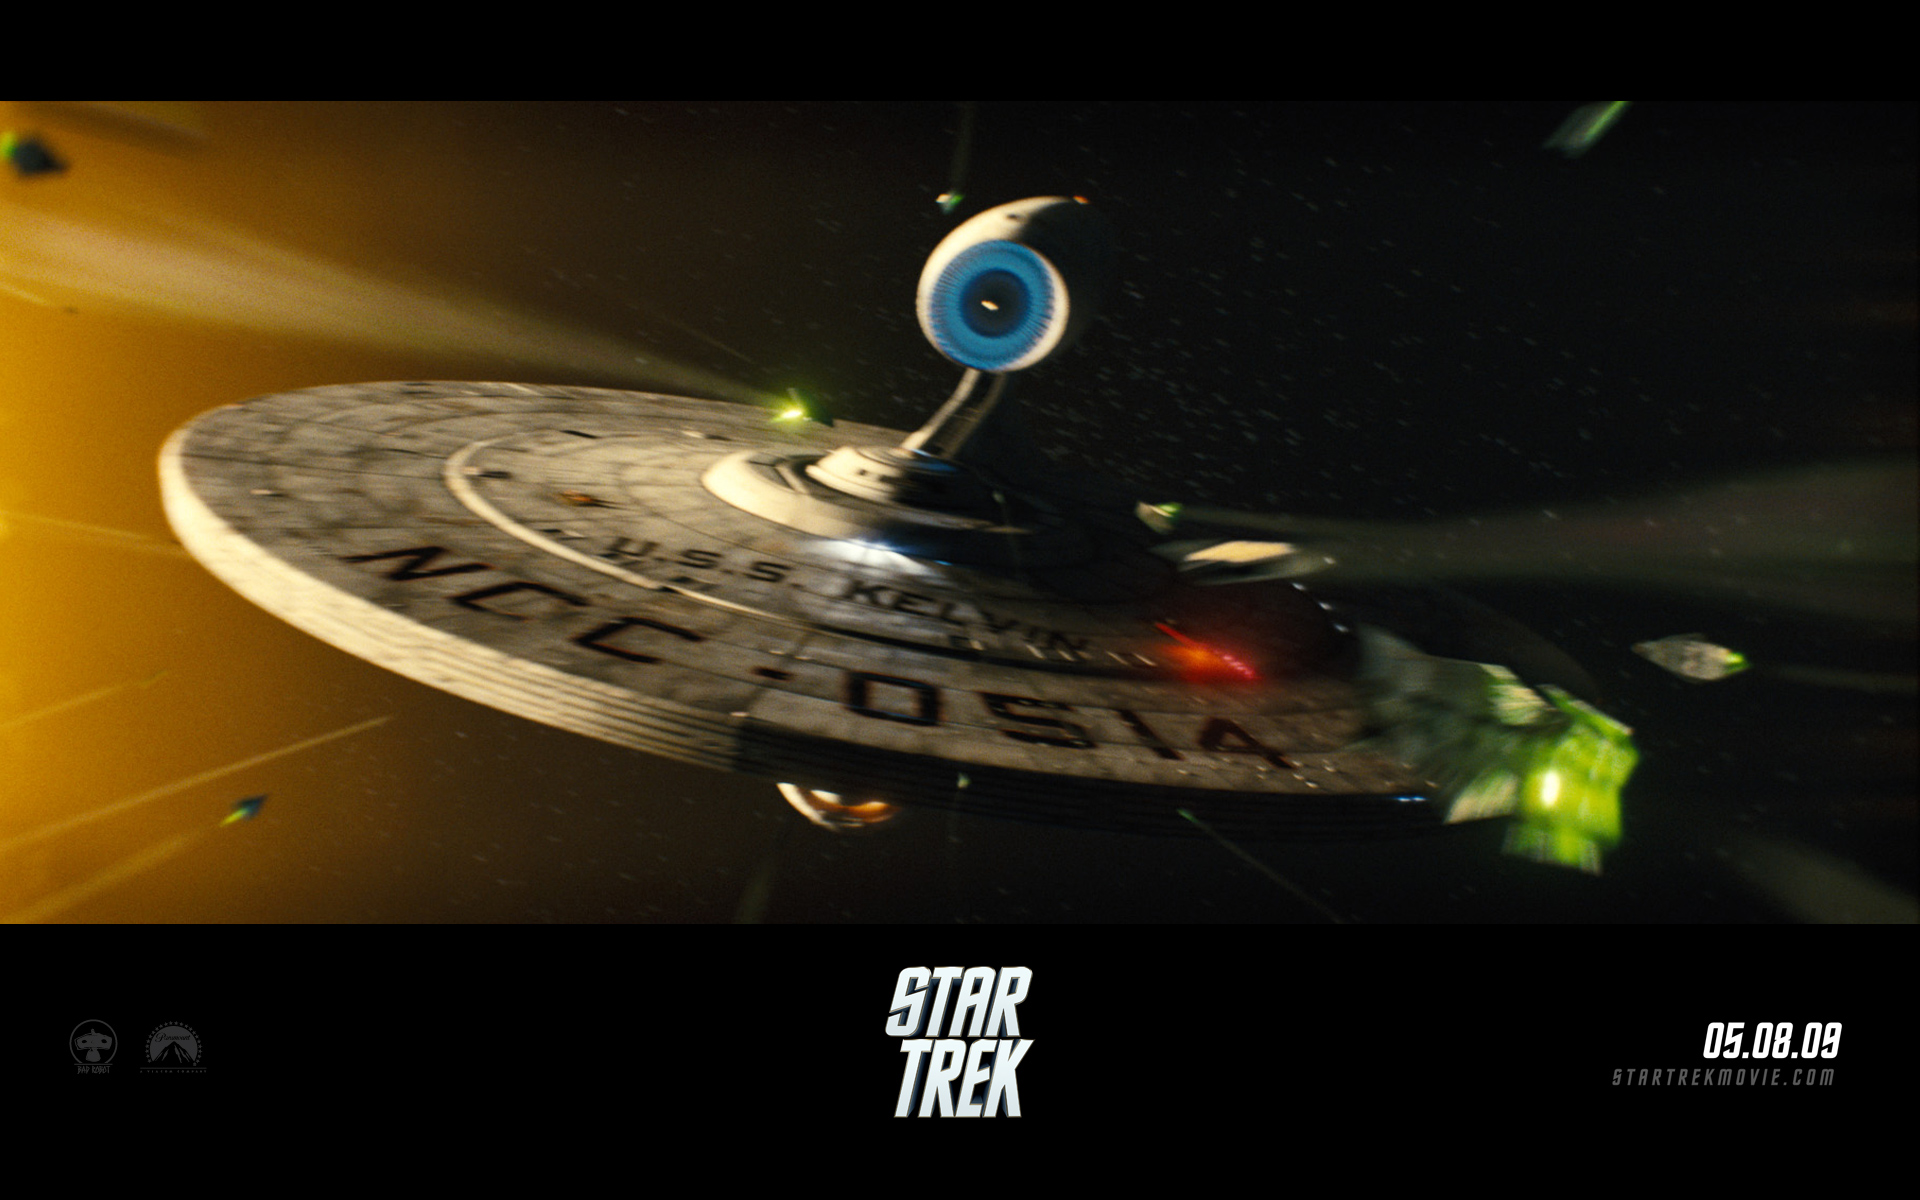 New Star Trek Wallpaper HD ImageBankbiz 1920x1200